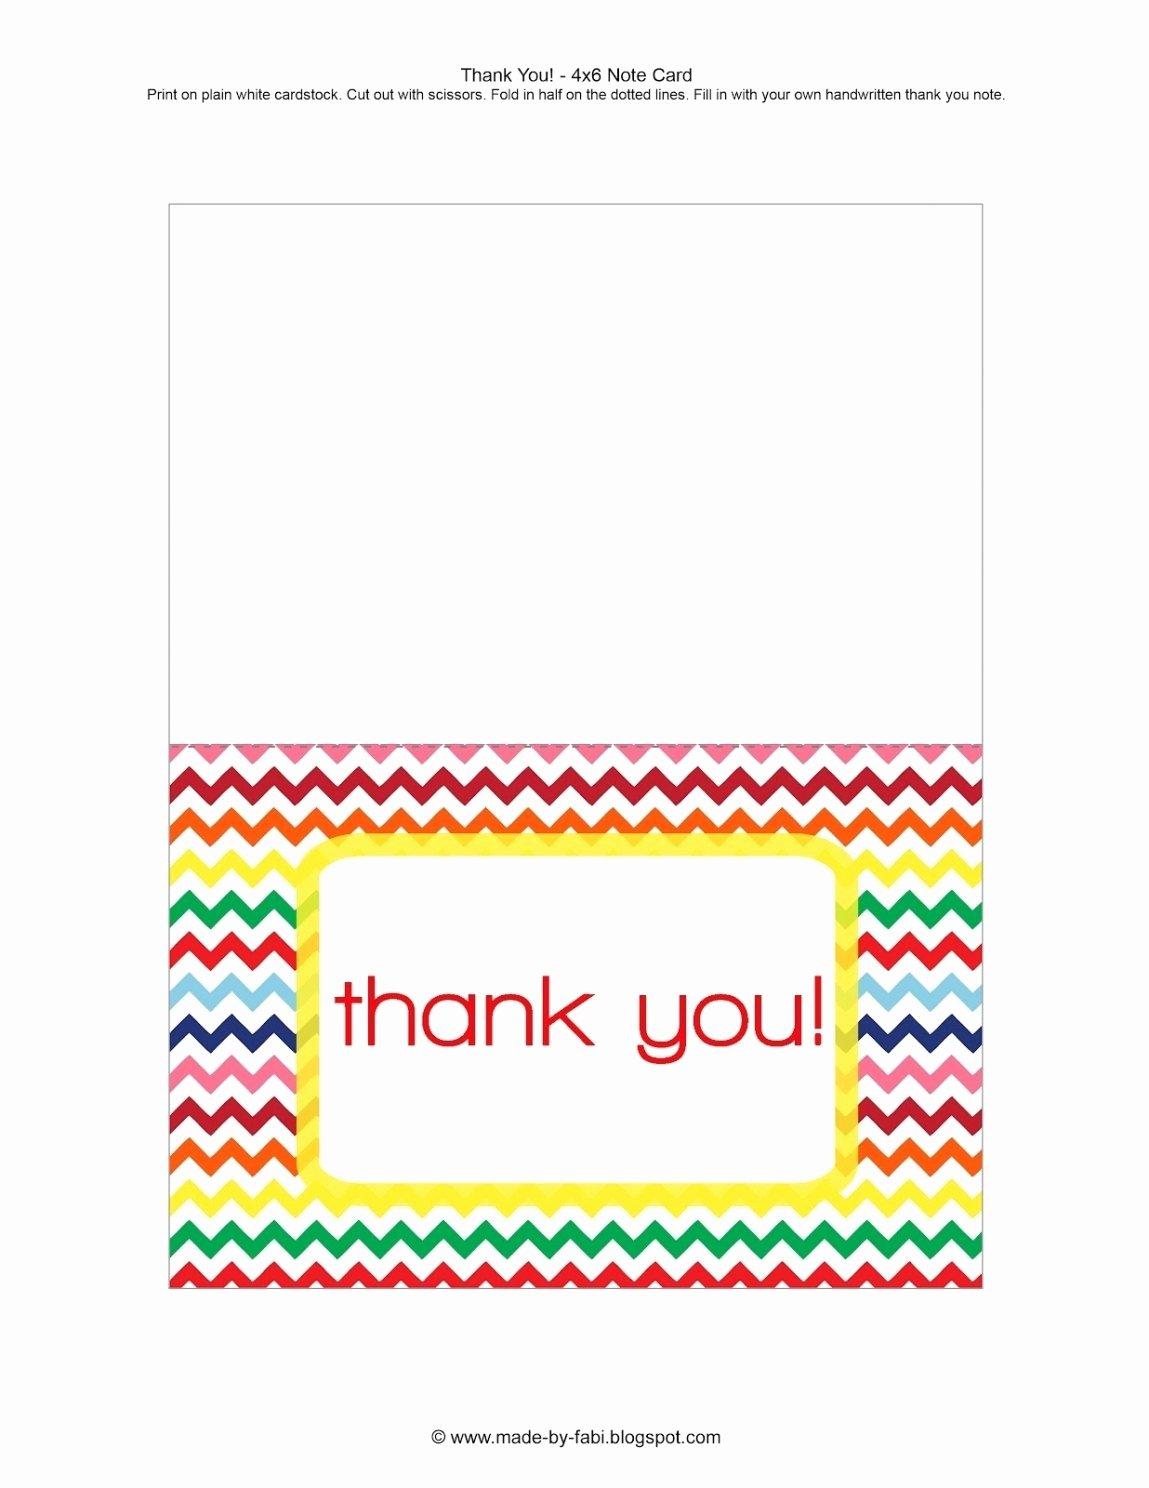 Thank You Card Template Word Fresh Printable Thank You Card Template Word